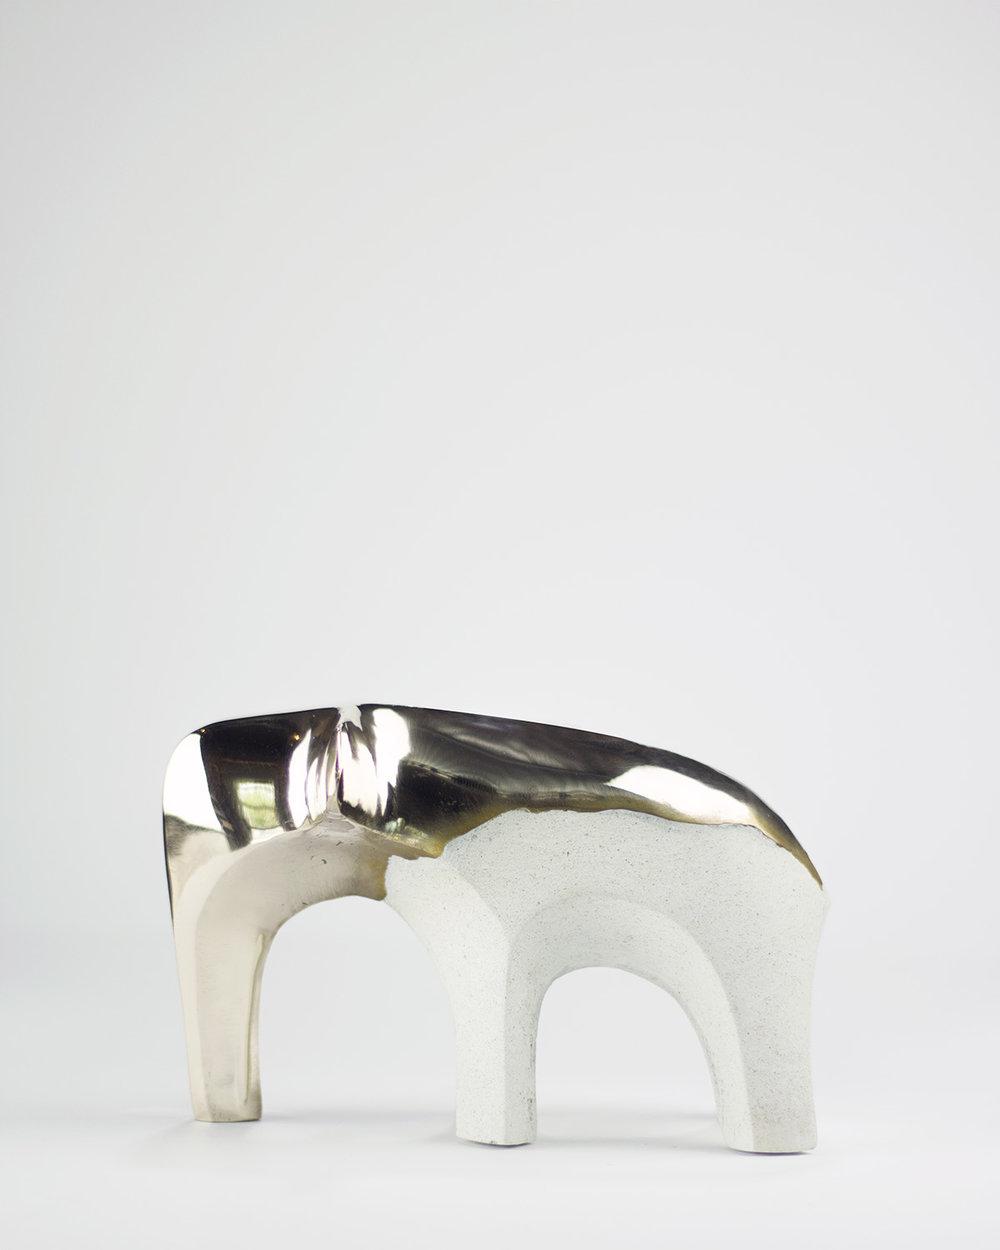 Evo Solid Bronze / Ivory $500